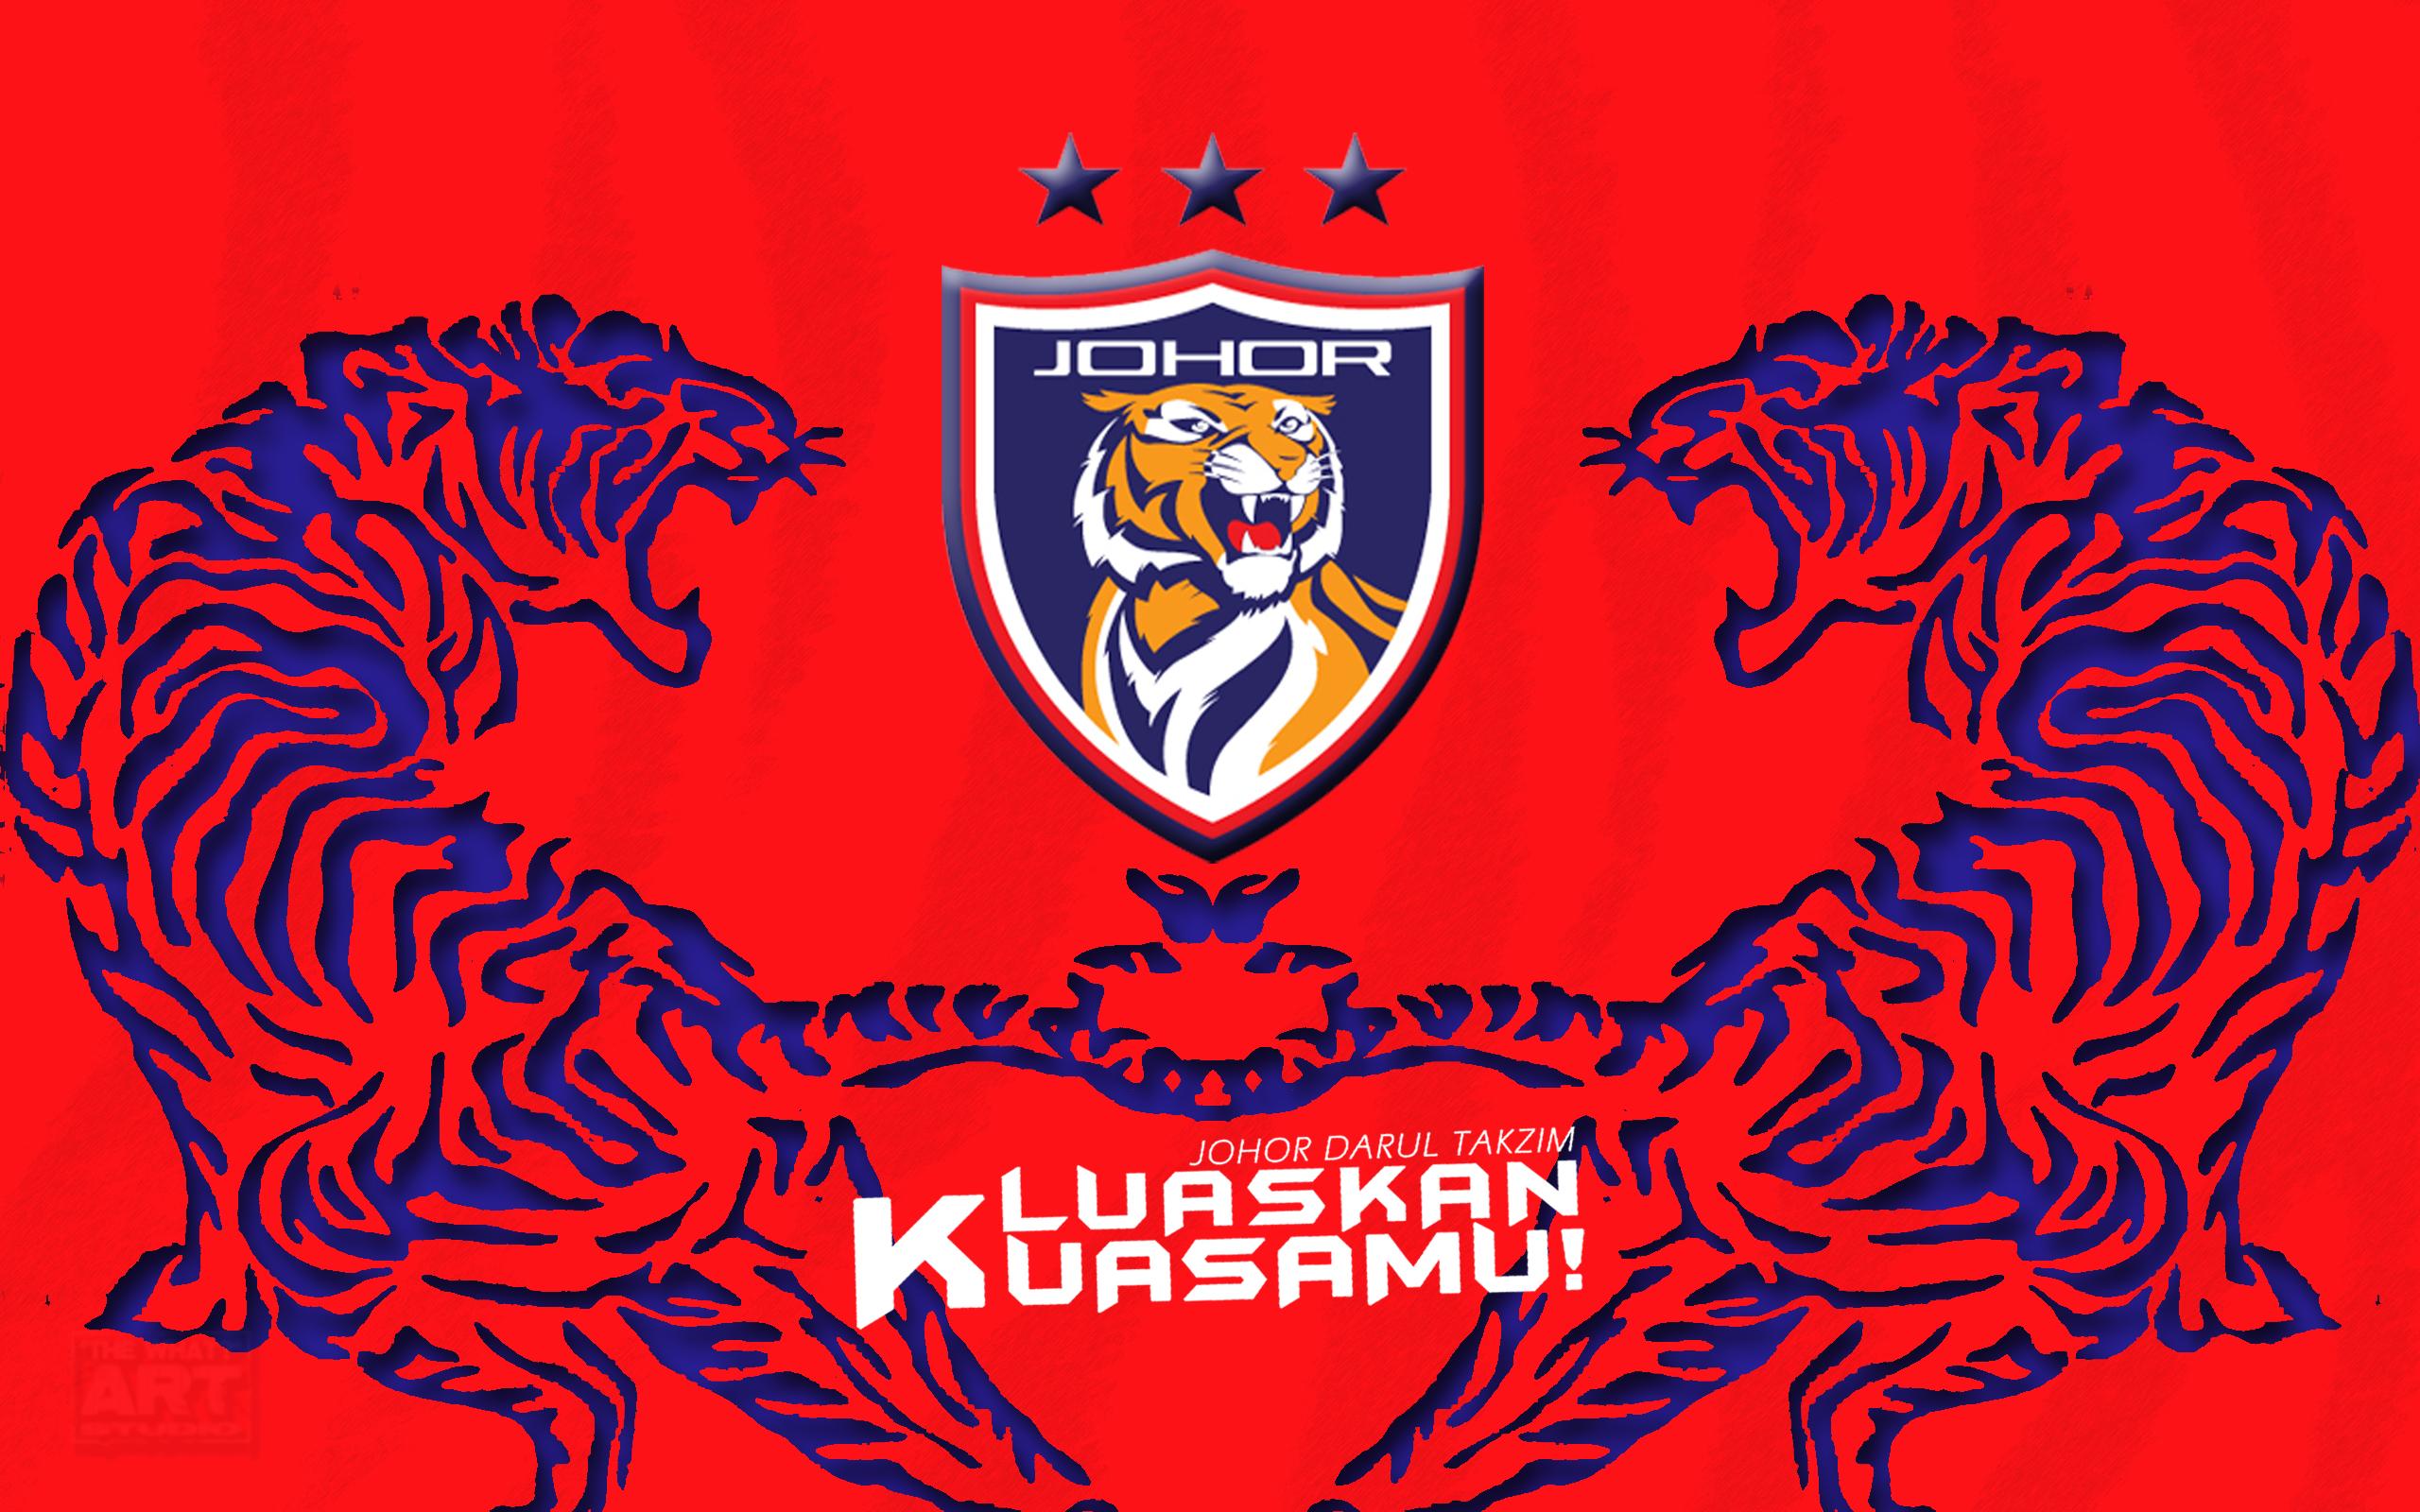 Gambar Johor Darul Takzim